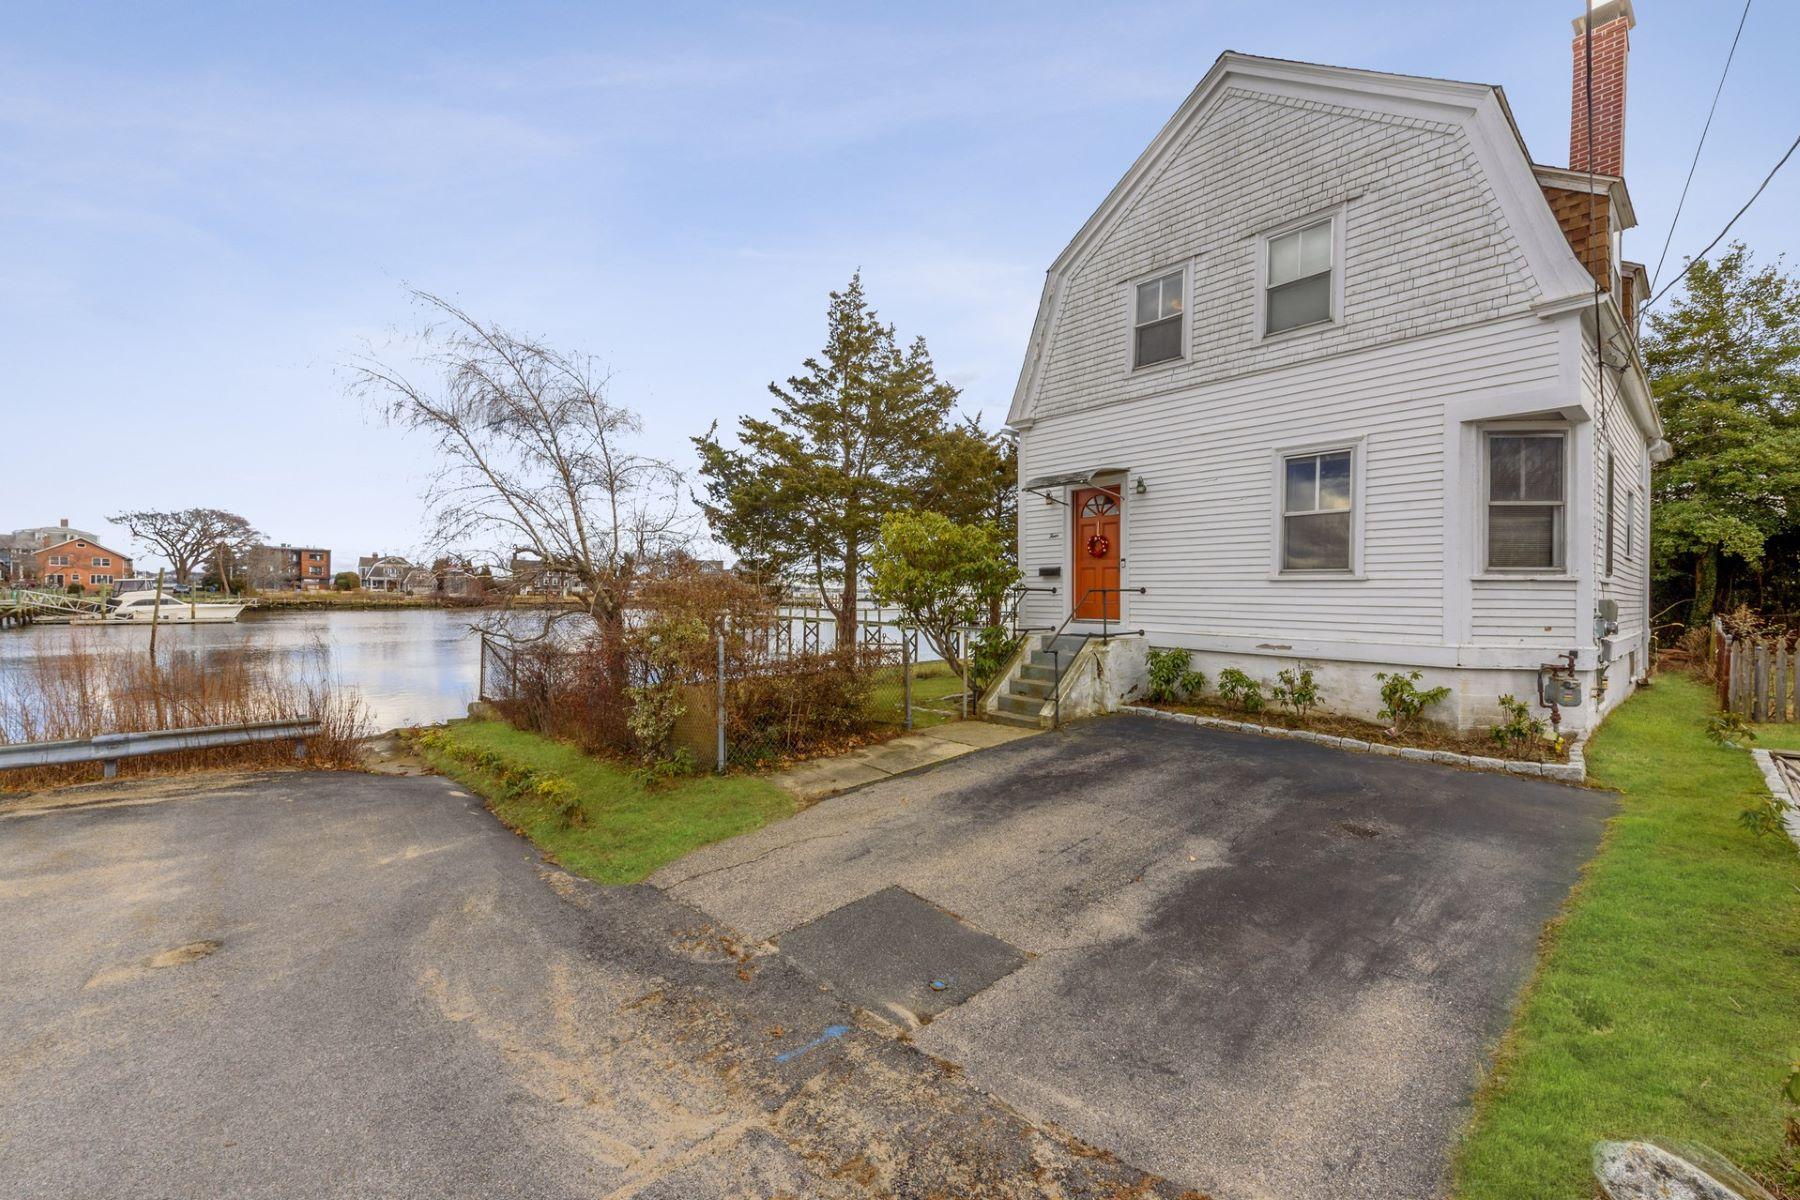 Single Family Homes for Sale at 4 Spring Garden Street, Warwick, RI Warwick, Rhode Island 02888 United States